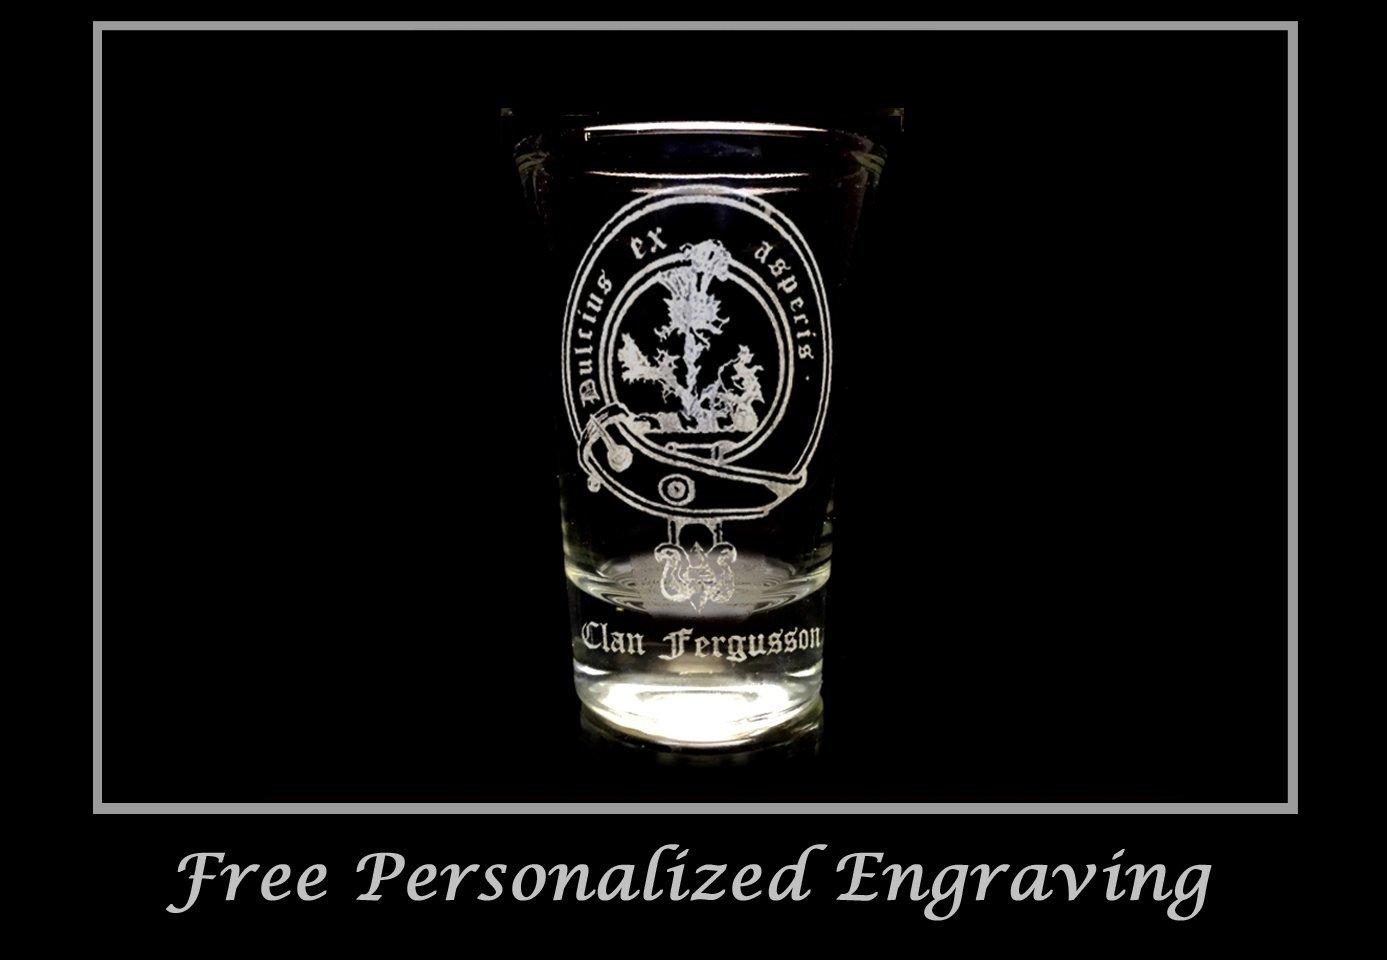 Fergusson, Ferguson Scottish Family Clan Crest Shot Glass 2oz - Free Personalized Engraving, Celtic Decor, Scottish Glass